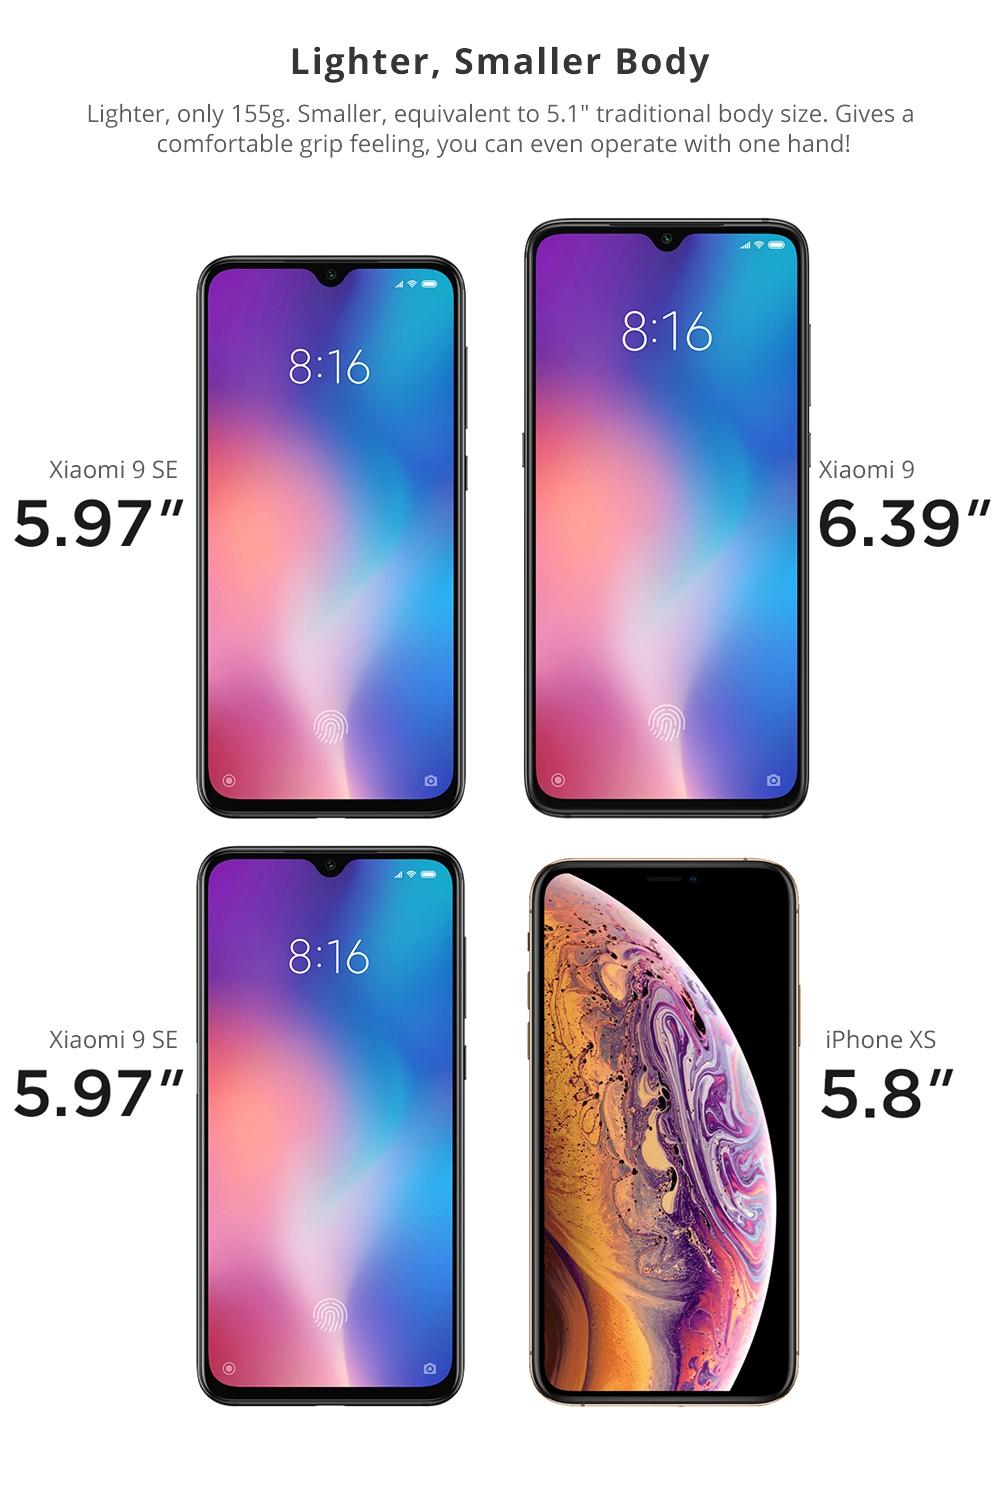 Xiaomi Mi 9 SE 5.97 Cal 4G LTE Smartphone Snapdragon 712 6GB 128GB 48.0MP + 8.0MP + 13.0MP Potrójne kamery tylne MIUI 10 In display Odcisk palca NFC